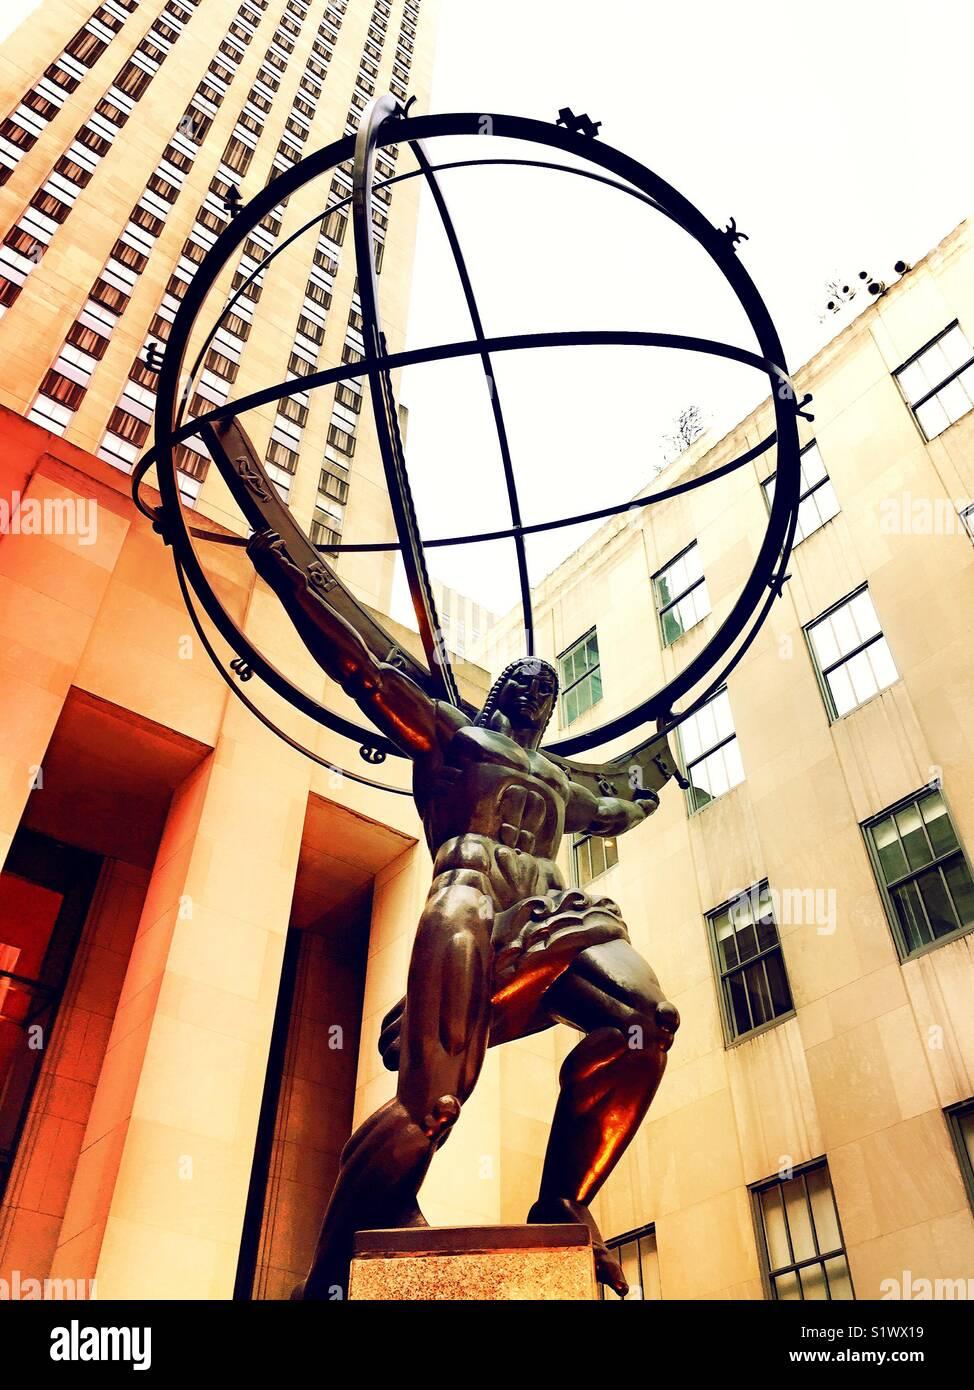 L'Atlas monde statue, Rockefeller Center, NEW YORK Photo Stock